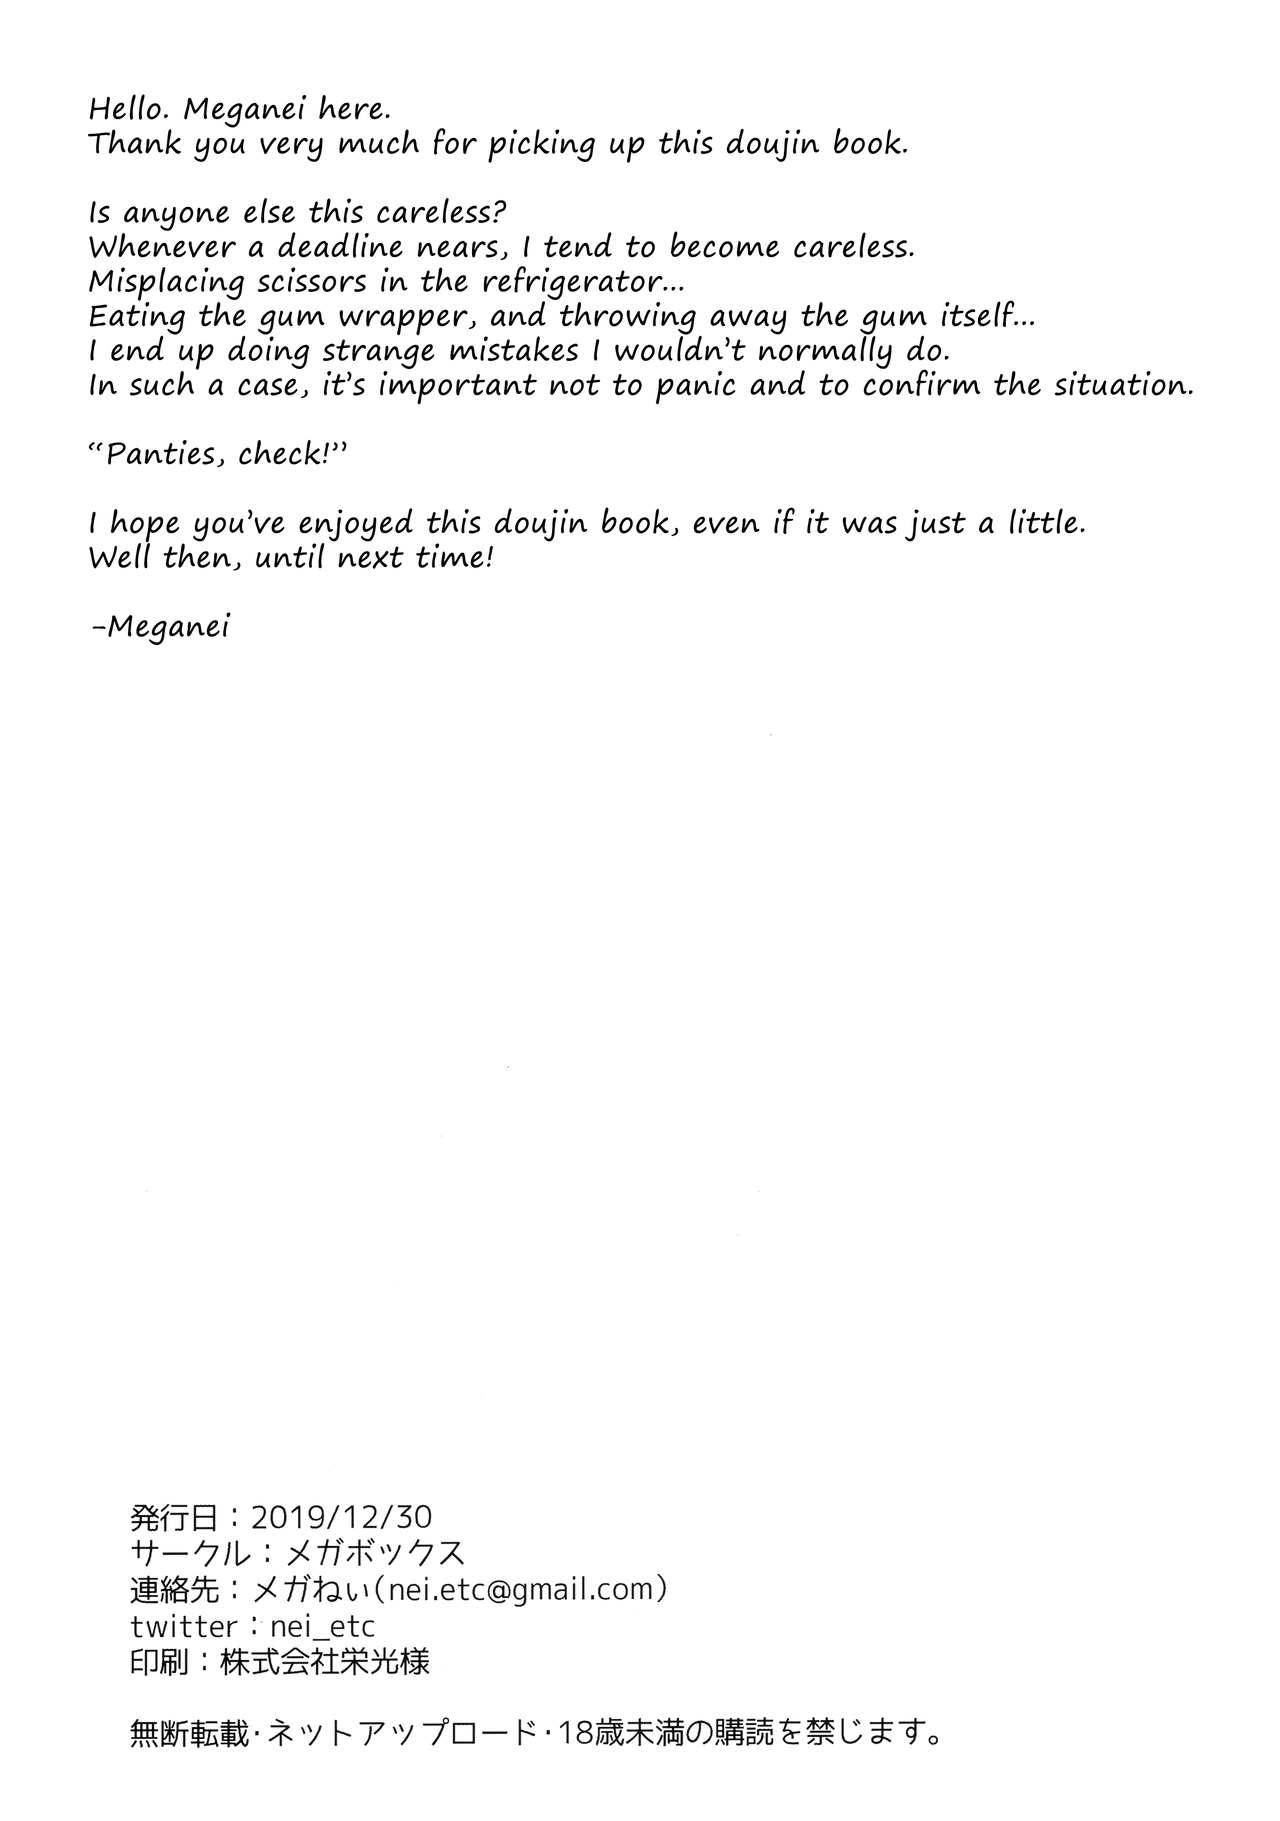 (C97) [Megabox (Meganei)] Onizuka-san Panty Wasureru   Onizuka-san Forgot Her Panties [English] [2cooked4you] 26